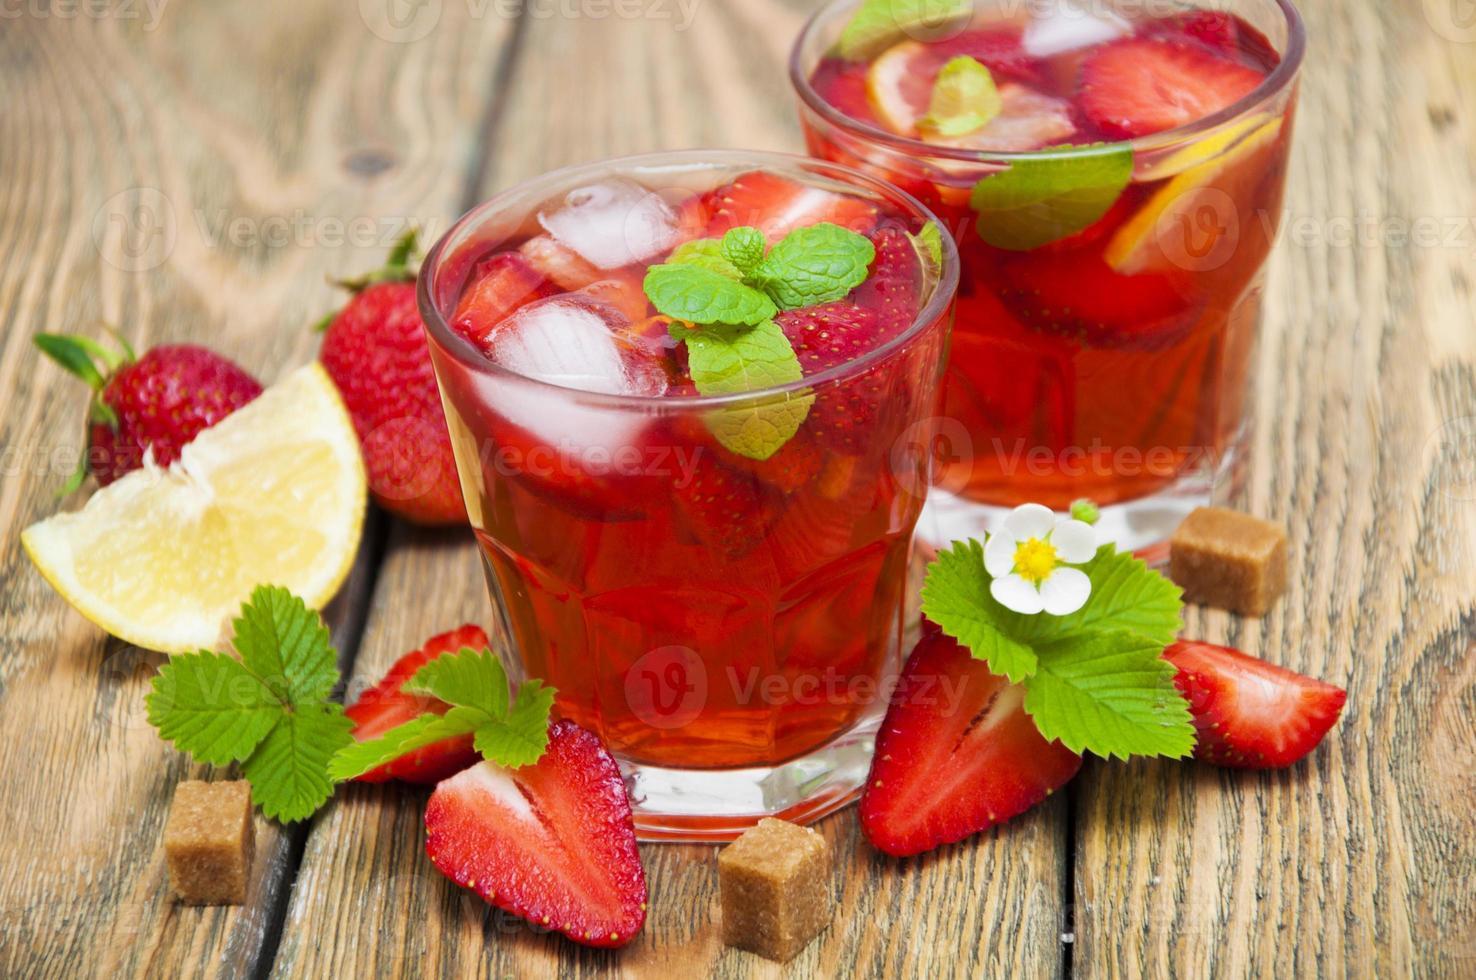 jordgubbsdrink foto